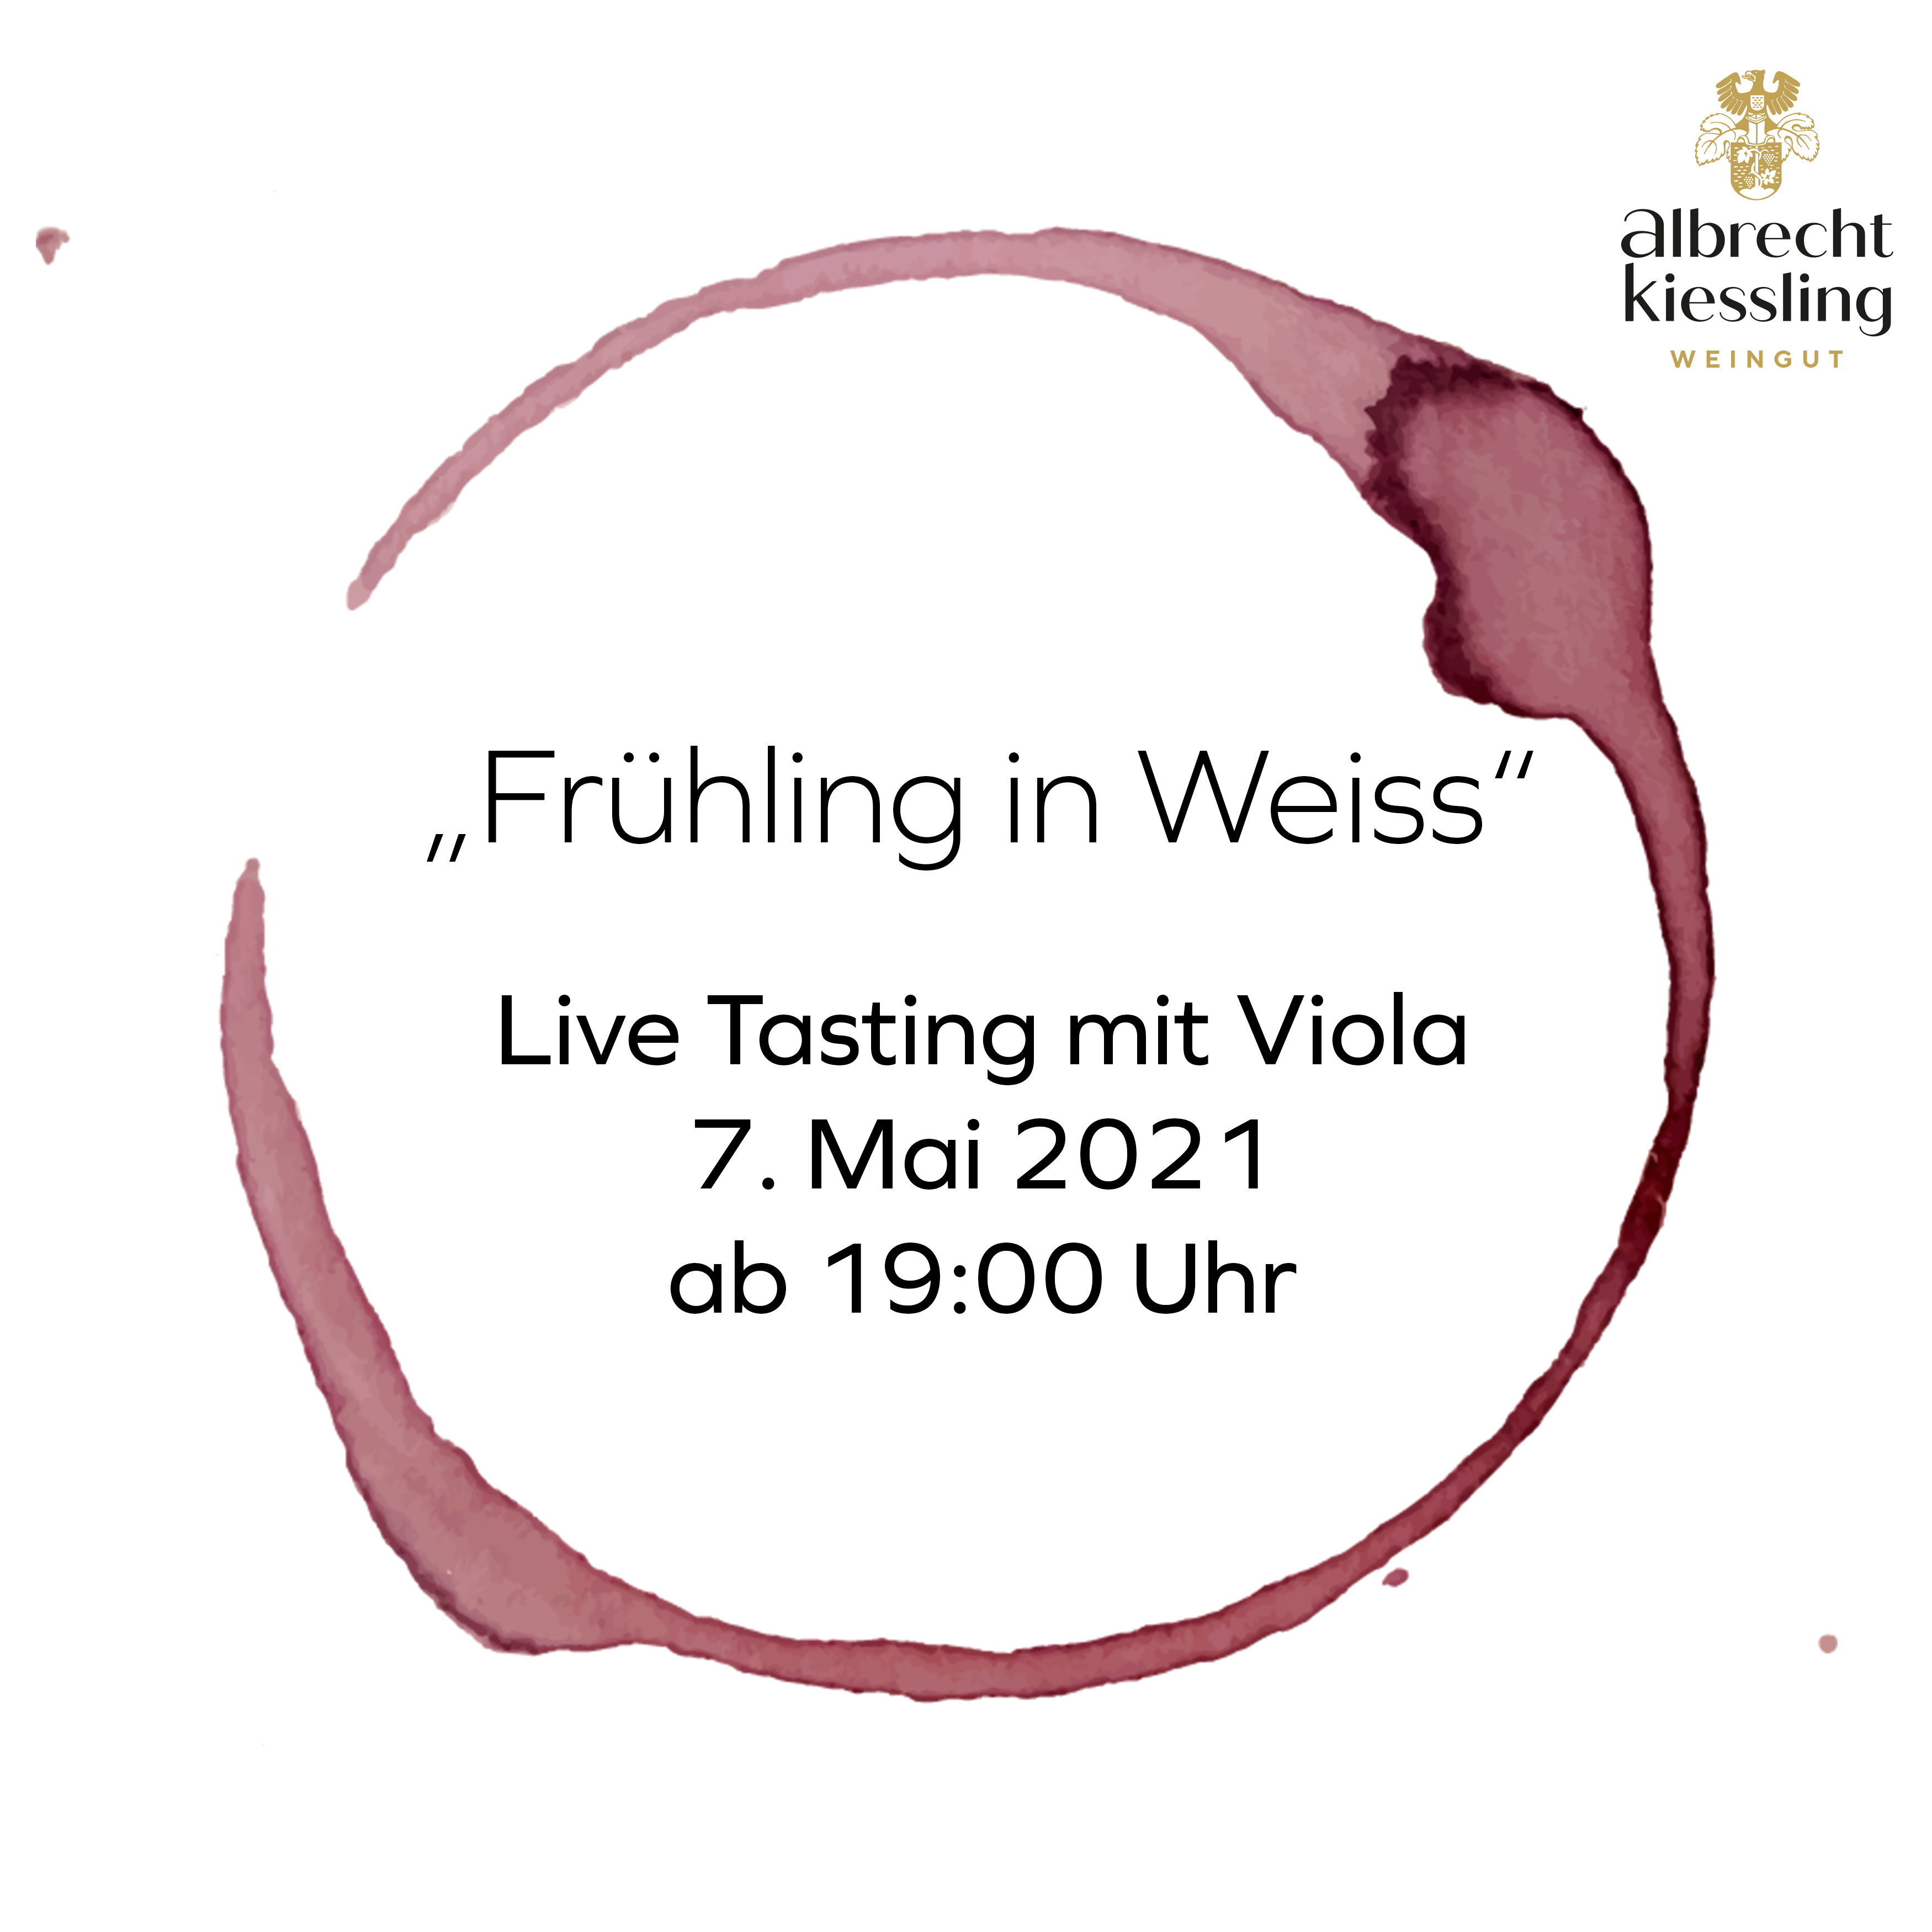 Live-Tasting mit Viola - Frühling in Weiss